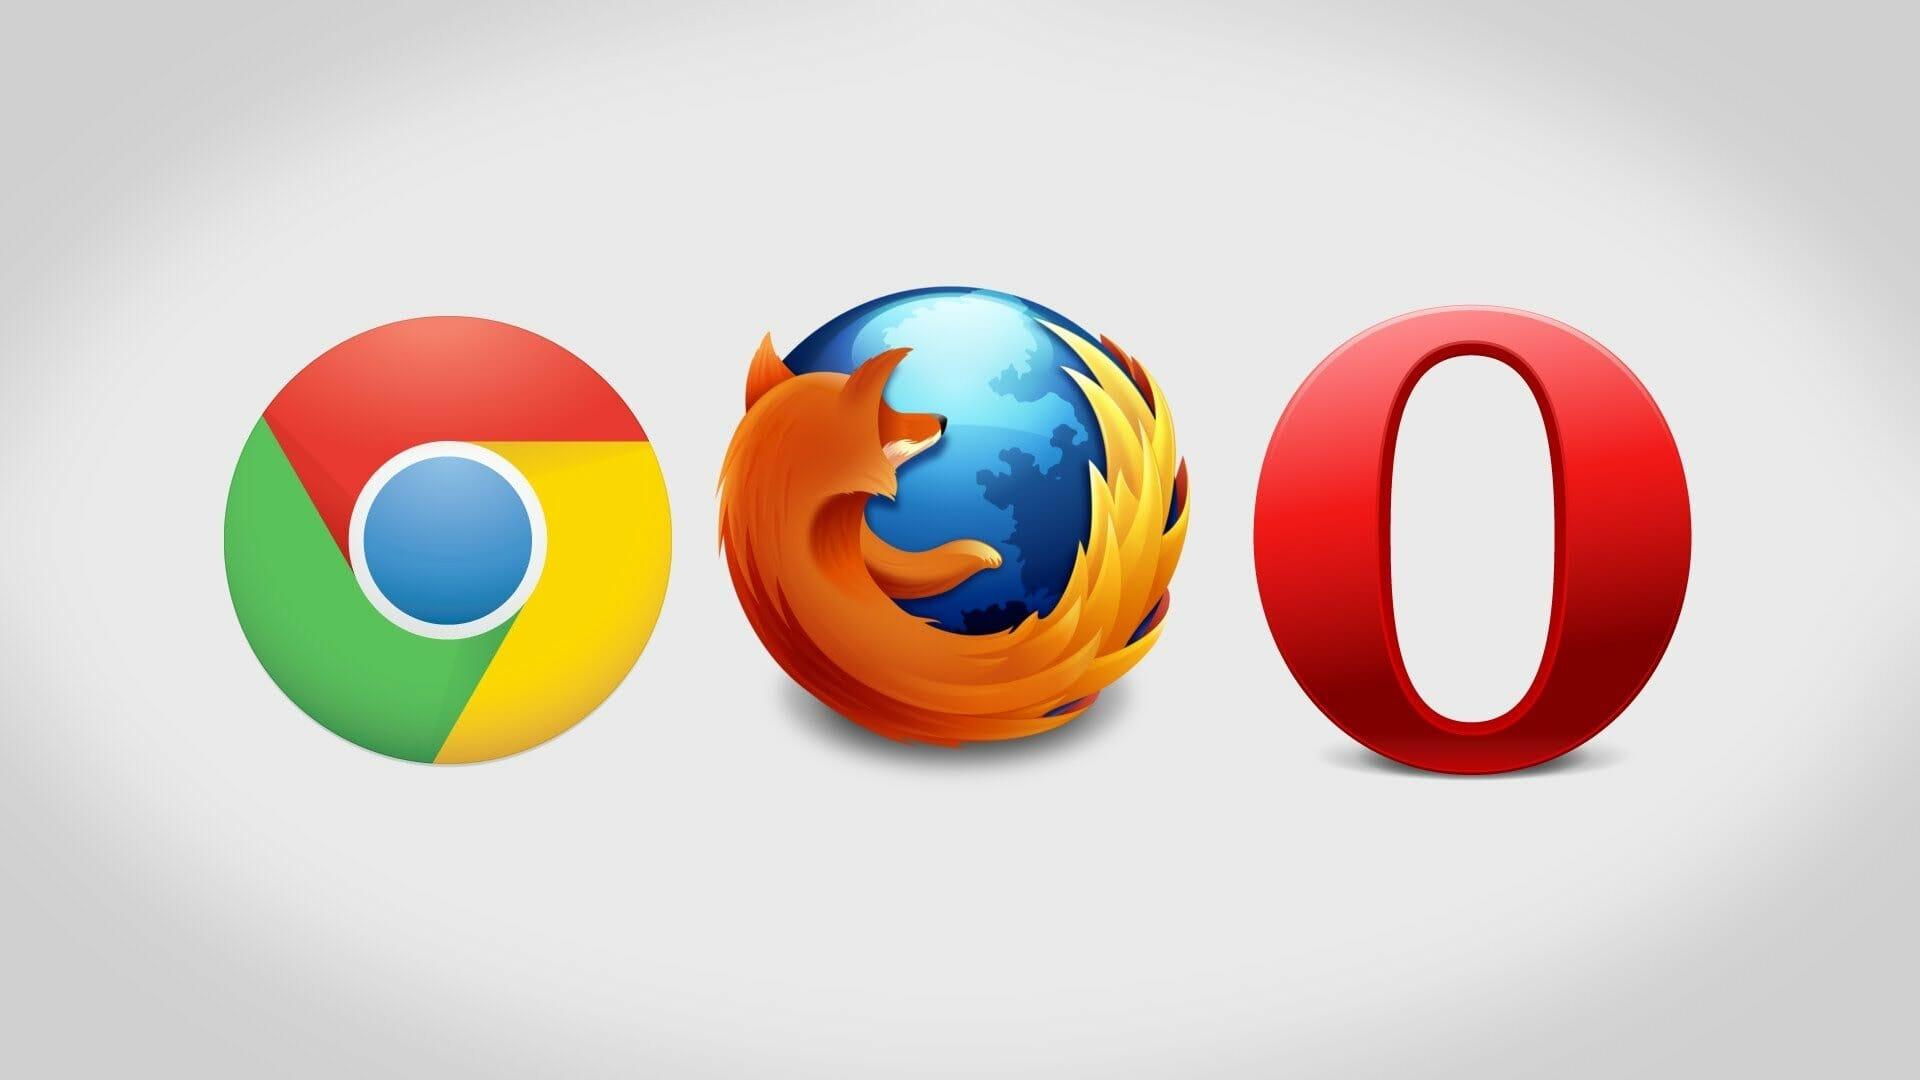 Google Chrome vs Mozilla Firefox vs Internet Explorer The